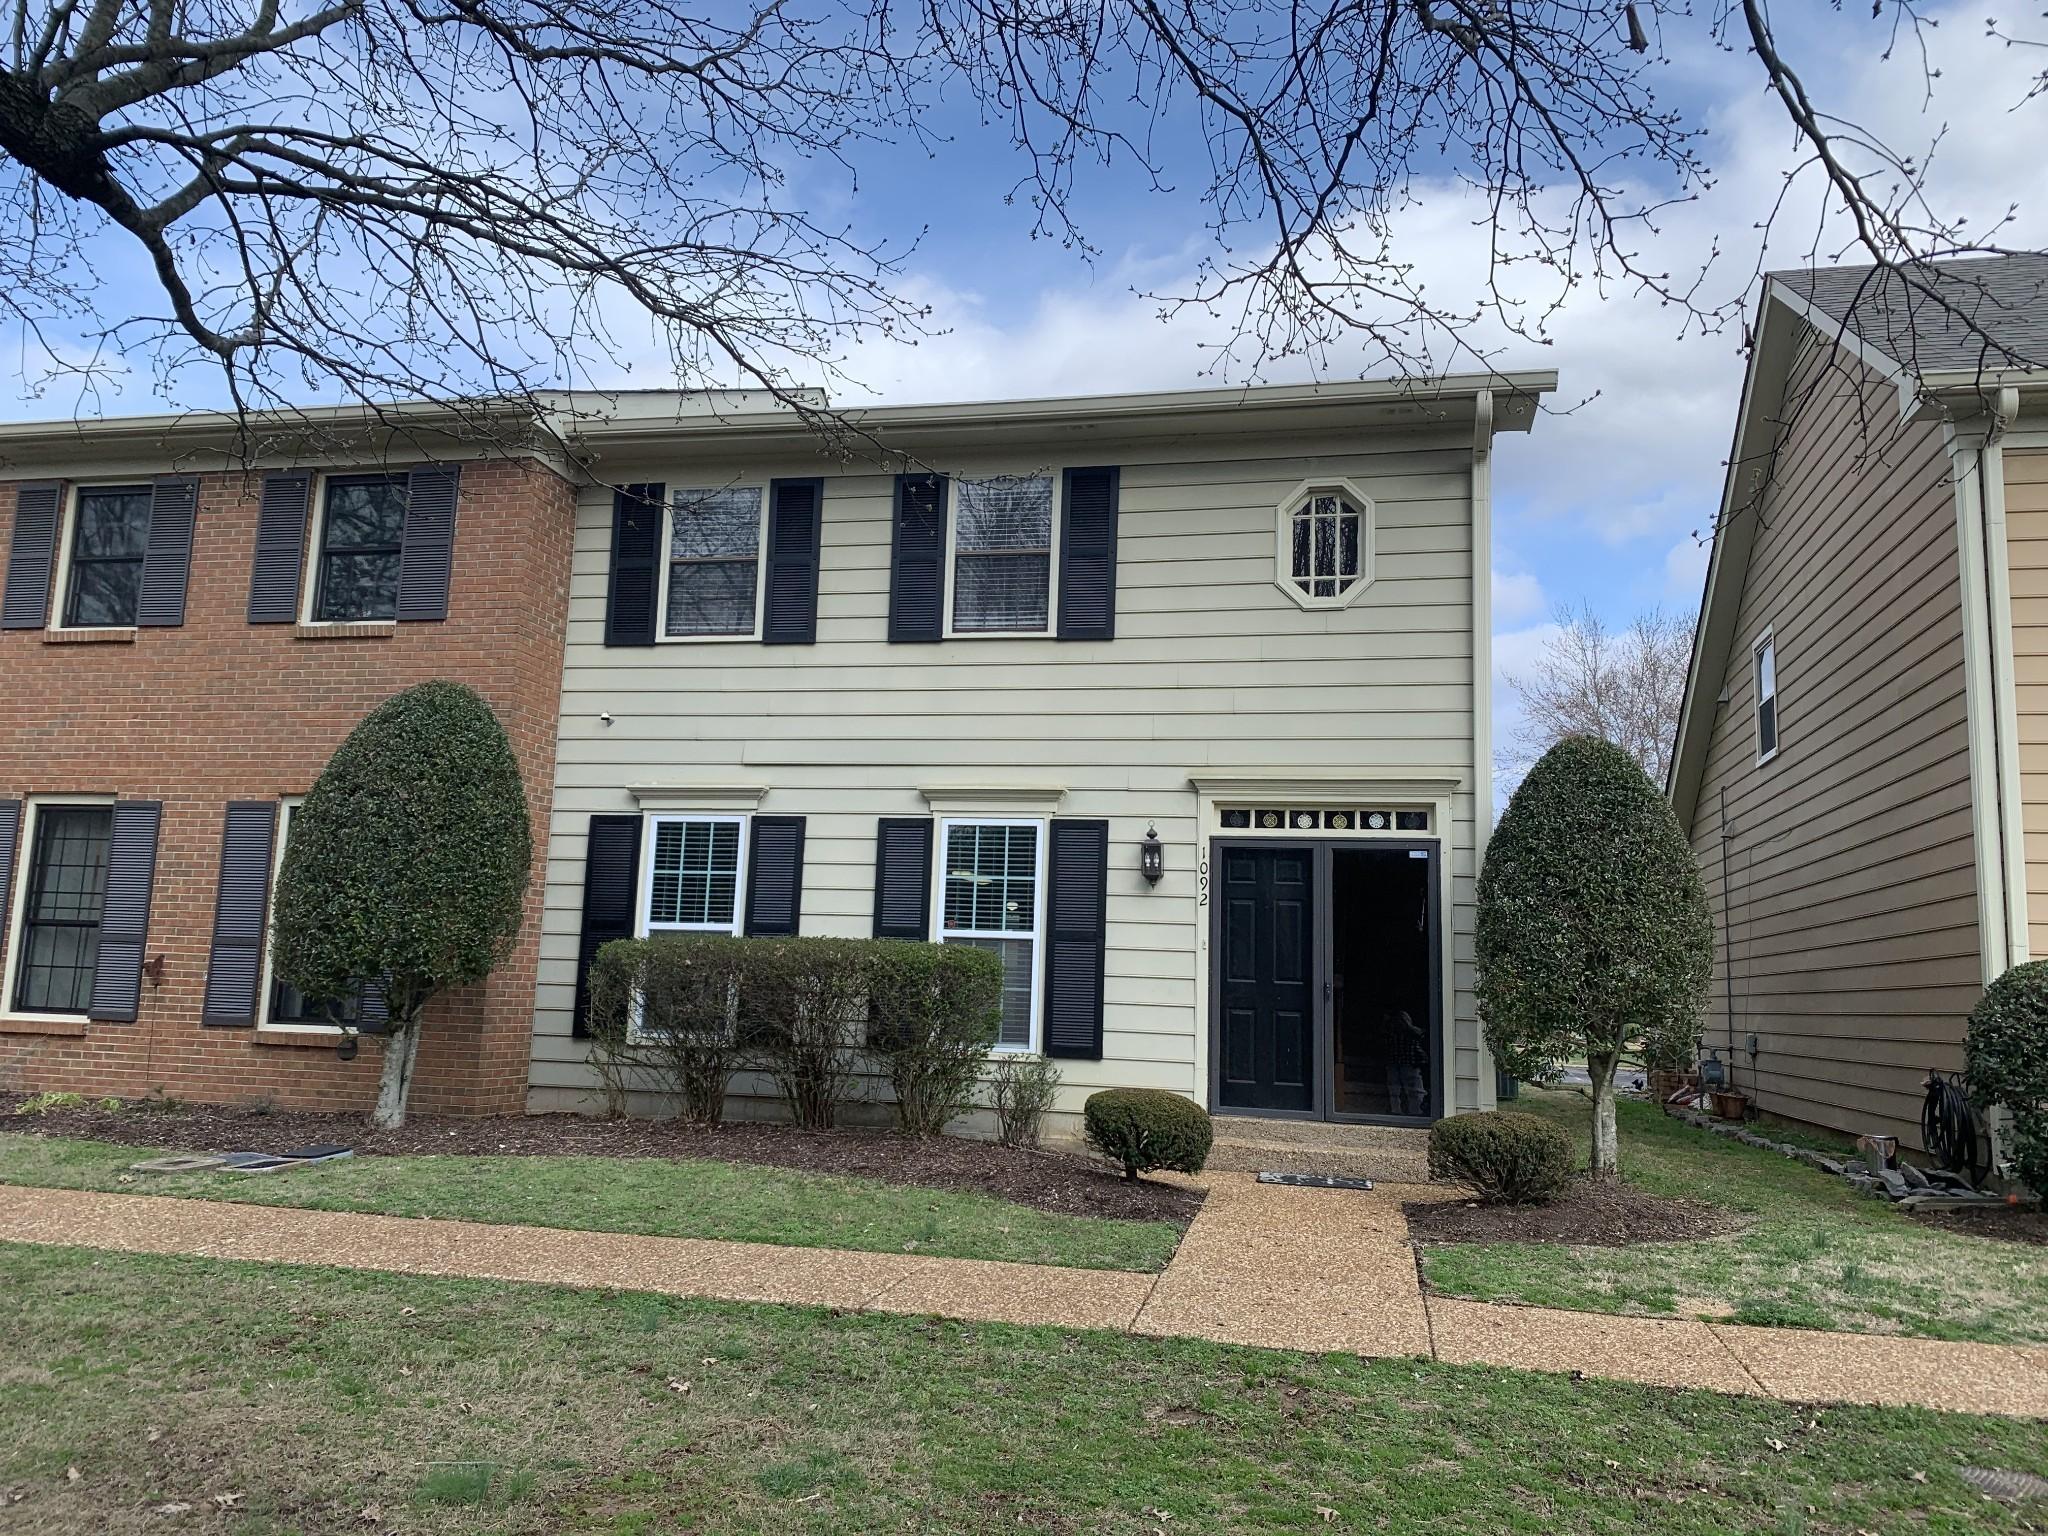 1092 General George Patton Rd, Nashville, TN 37221 - Nashville, TN real estate listing